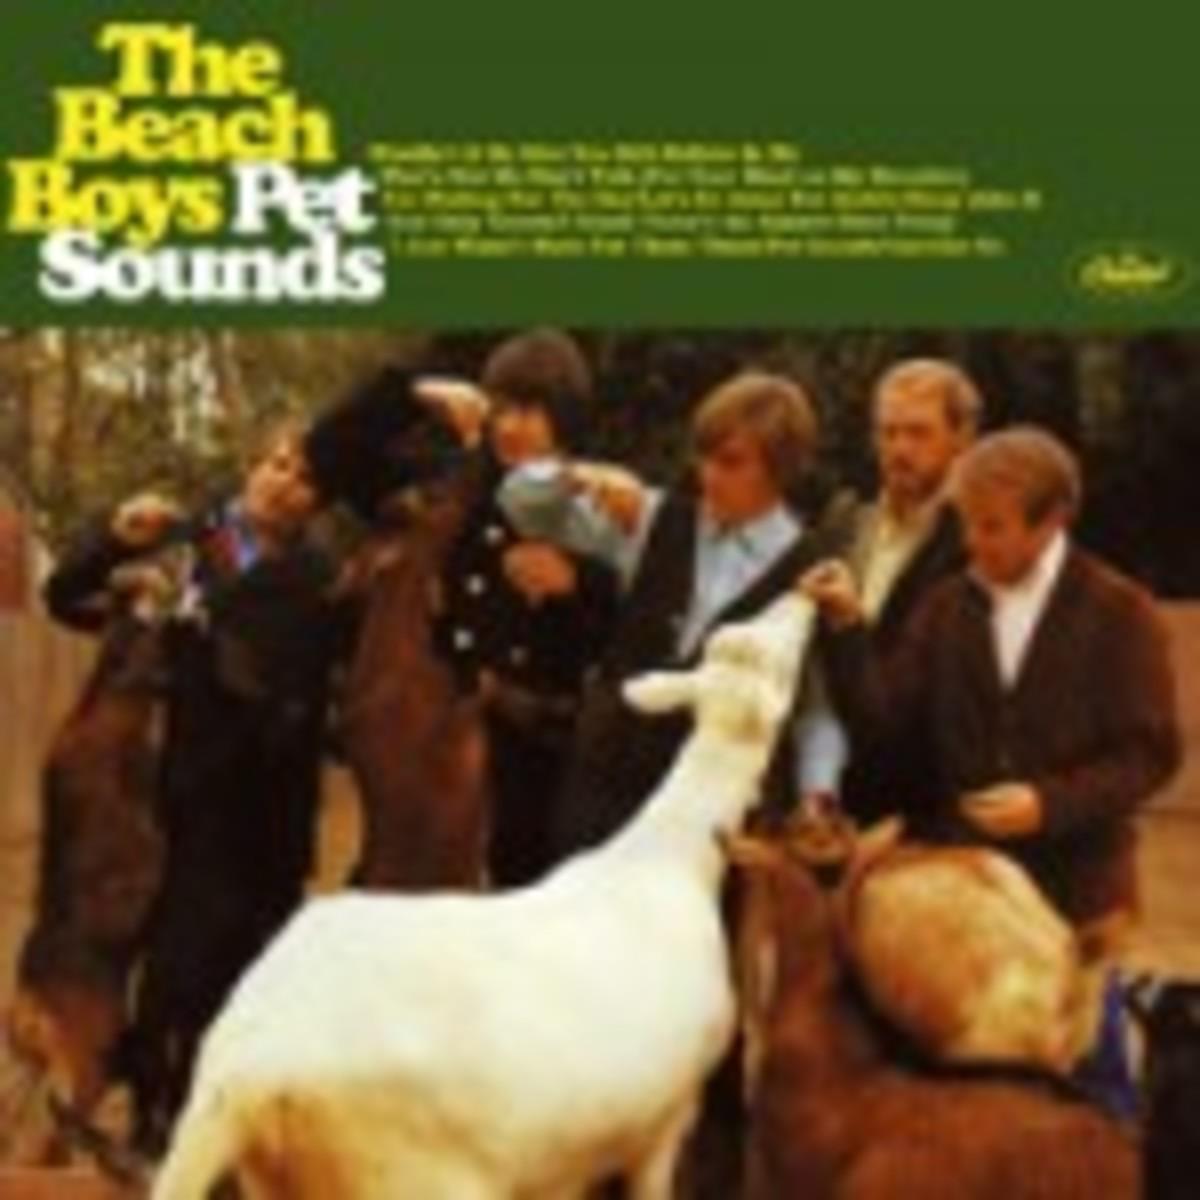 The Beach Boys Pet Sounds